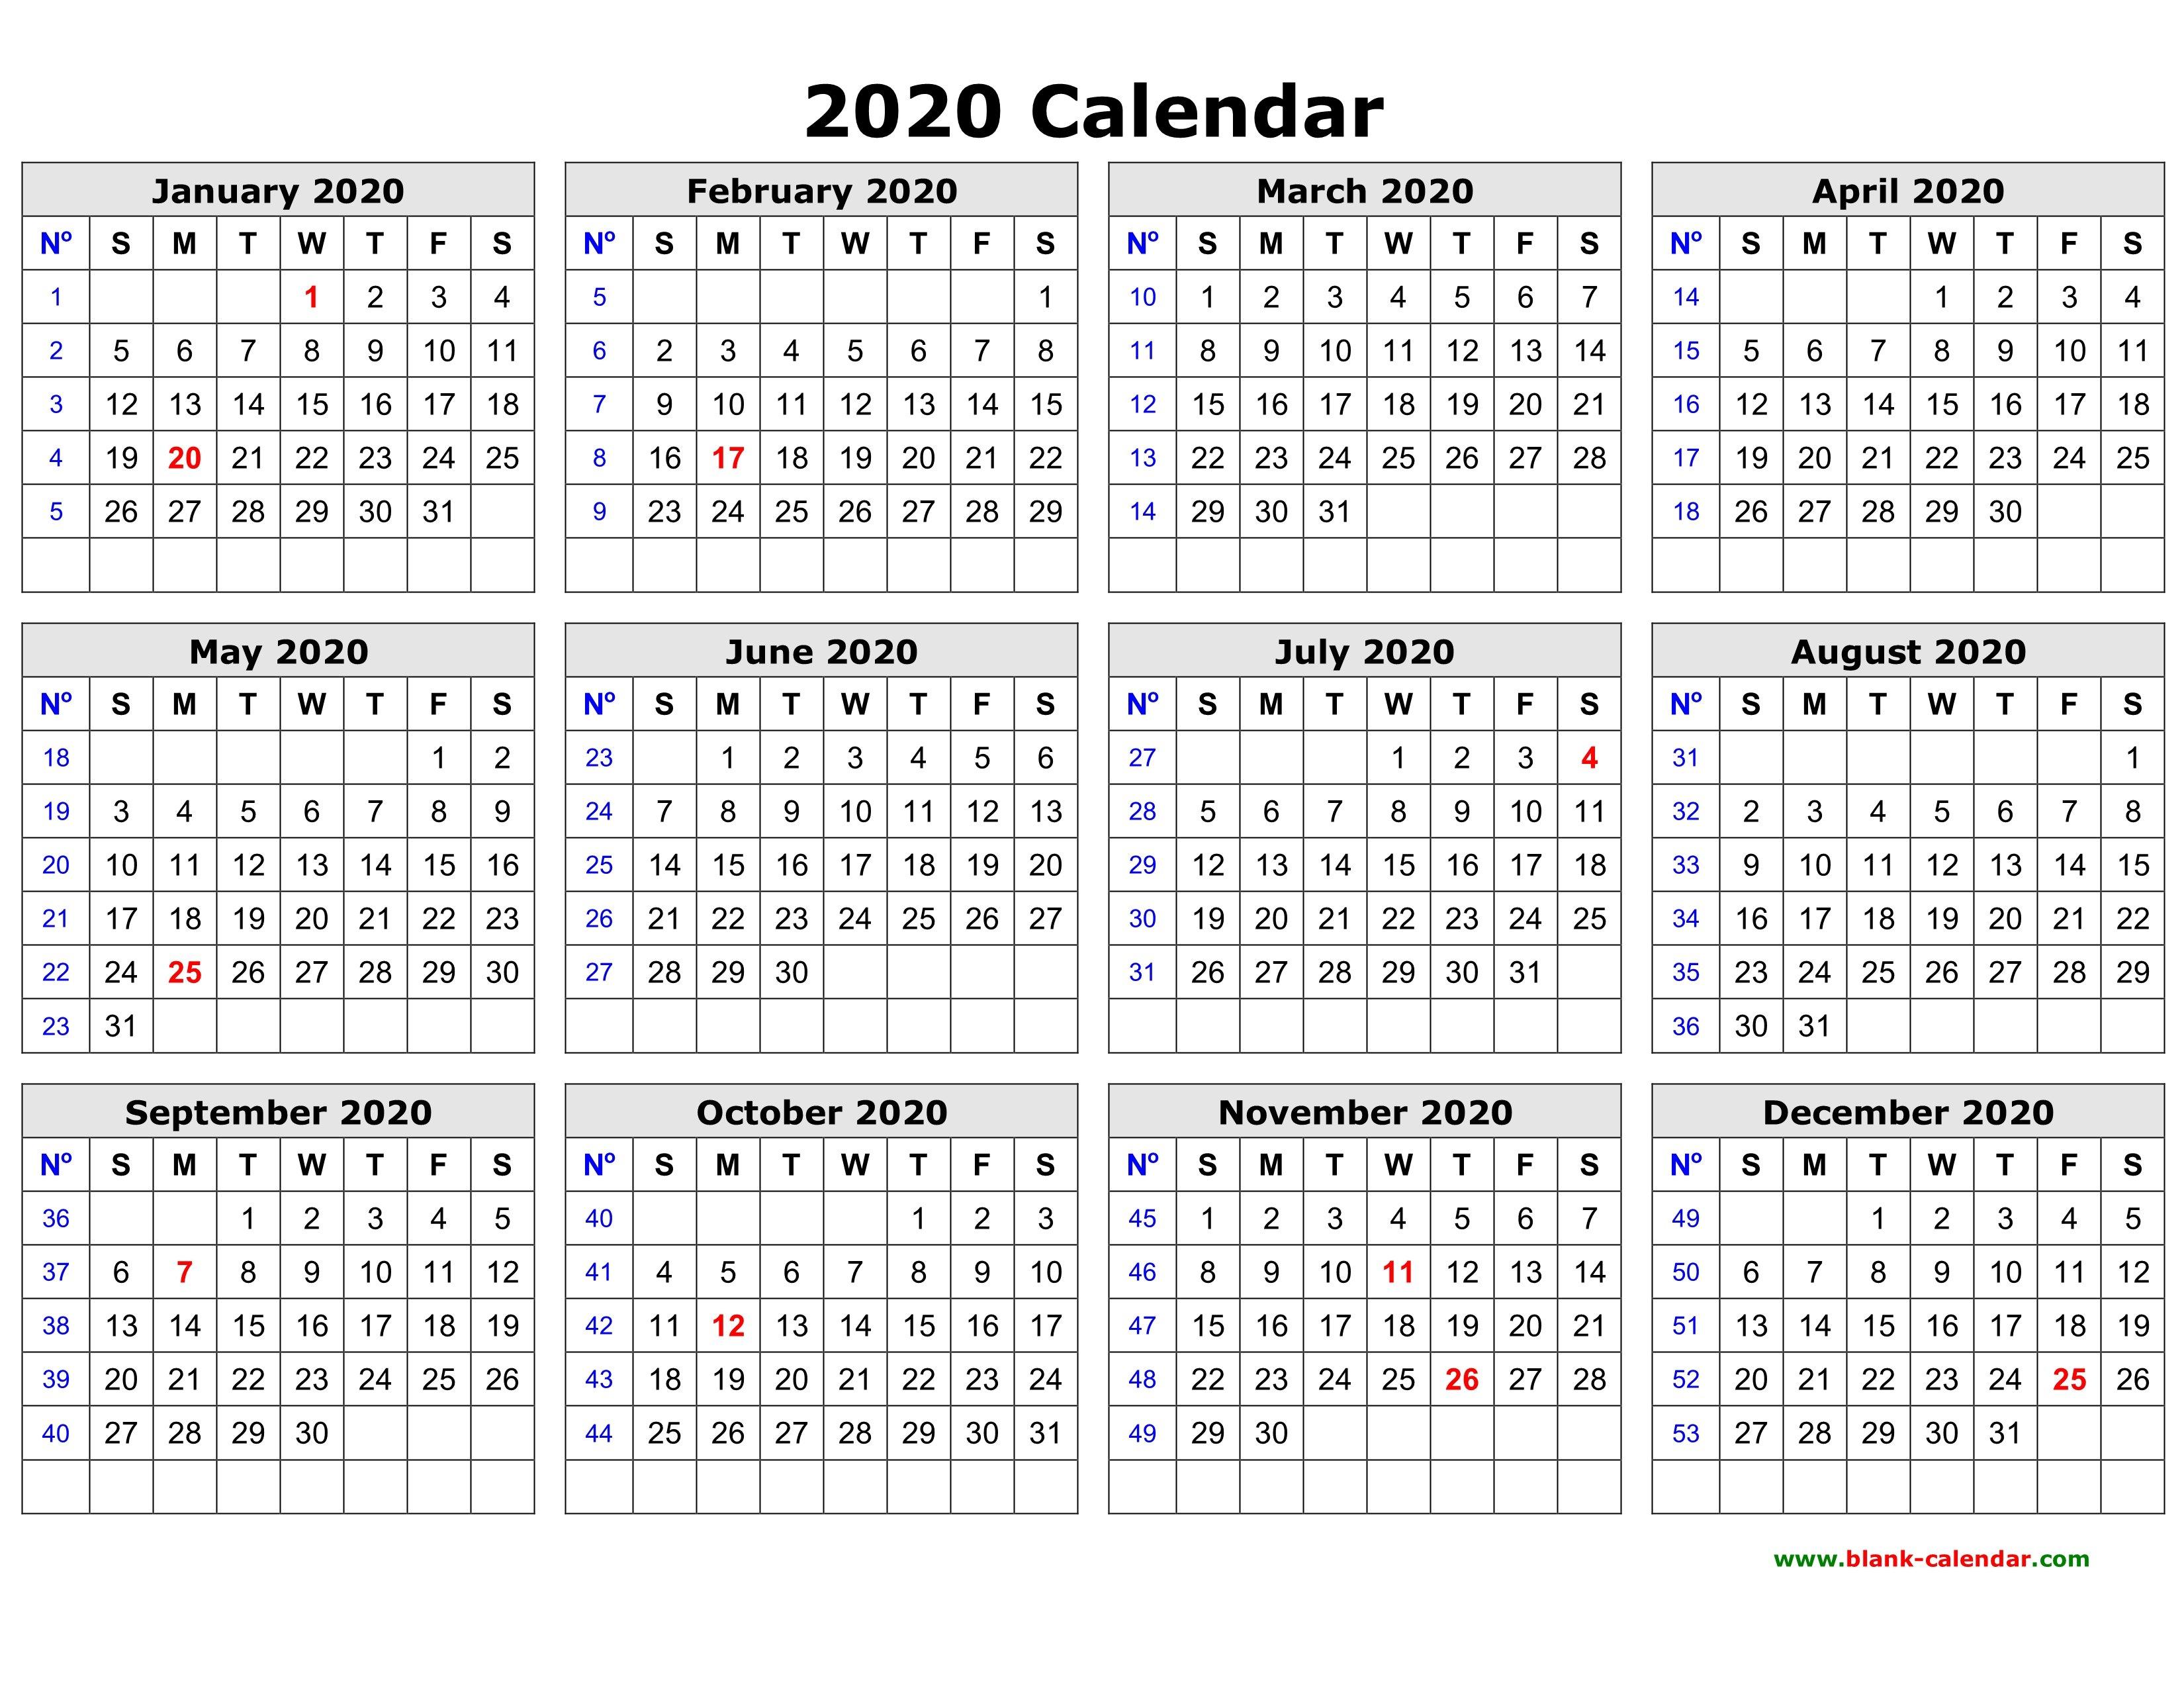 Free Download Printable Calendar 2020 In One Page, Clean Design. 4 Year Printable Calendar